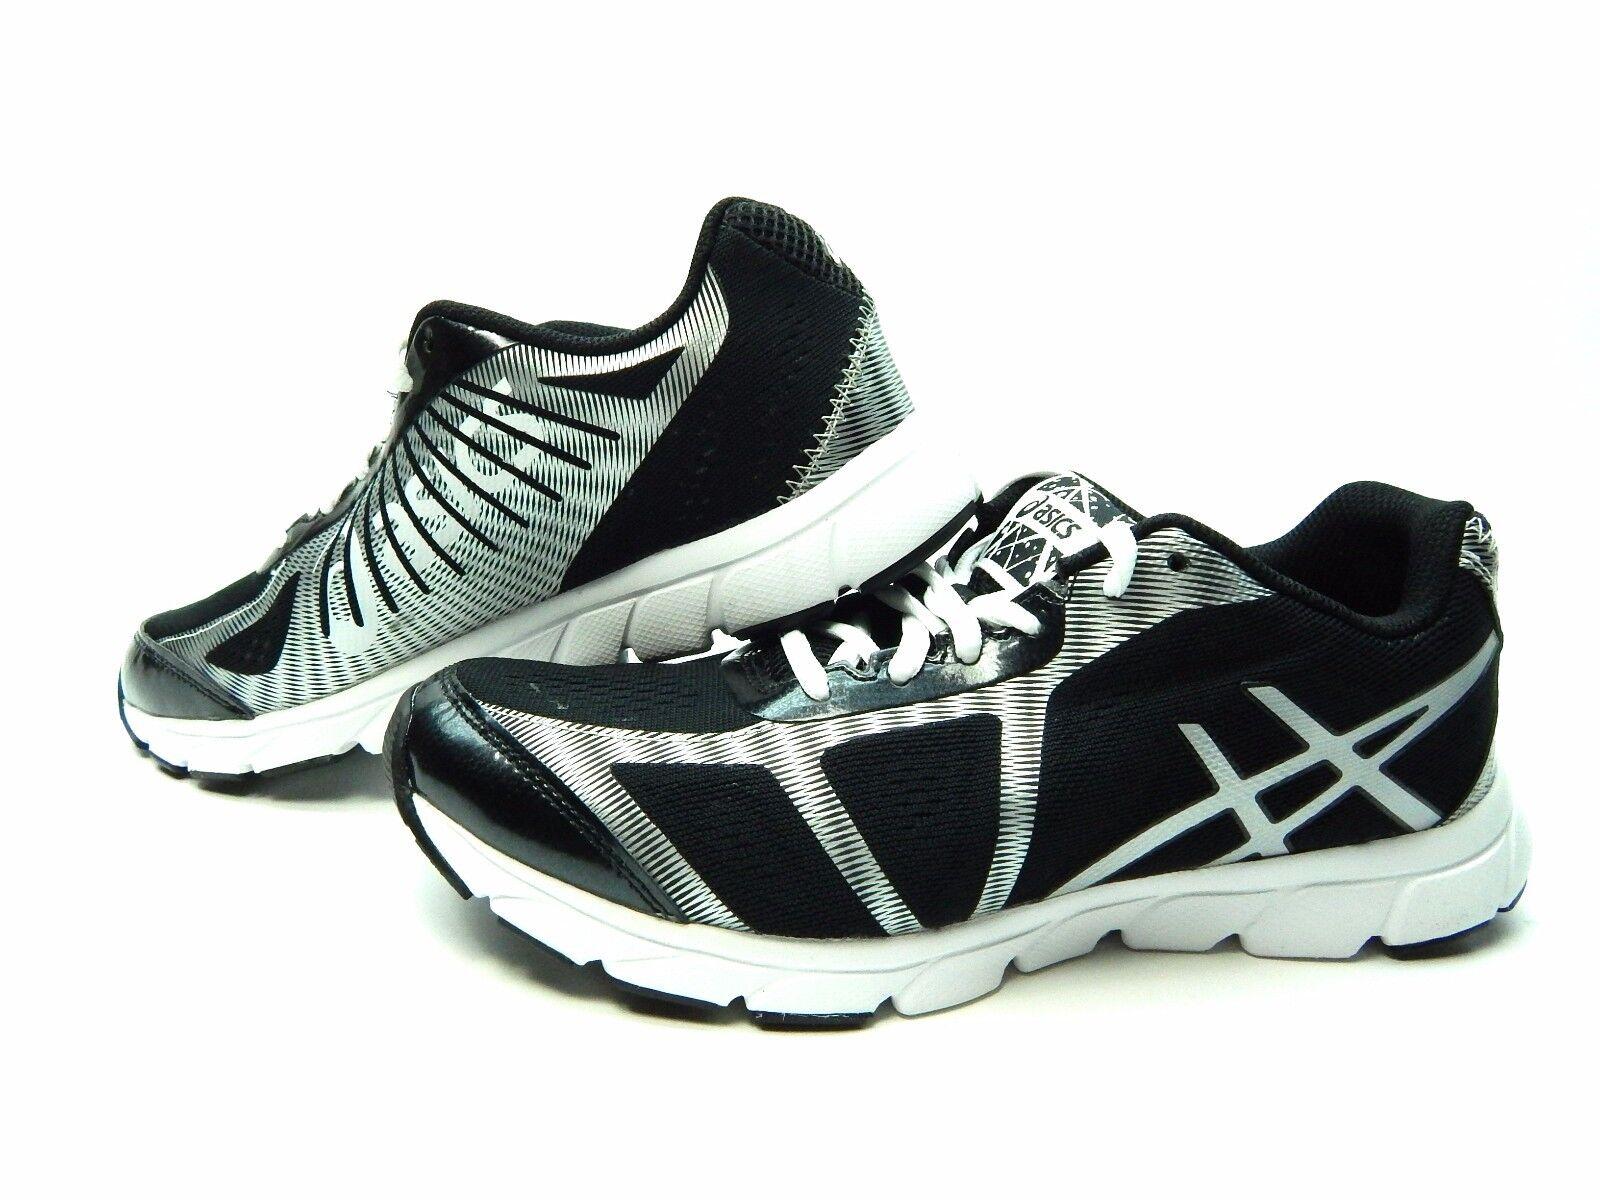 ASICS GEL HAVOC 2 Noir LIGHTNING Blanc ATHLETIC Homme Chaussures Taille 7 & 8.5